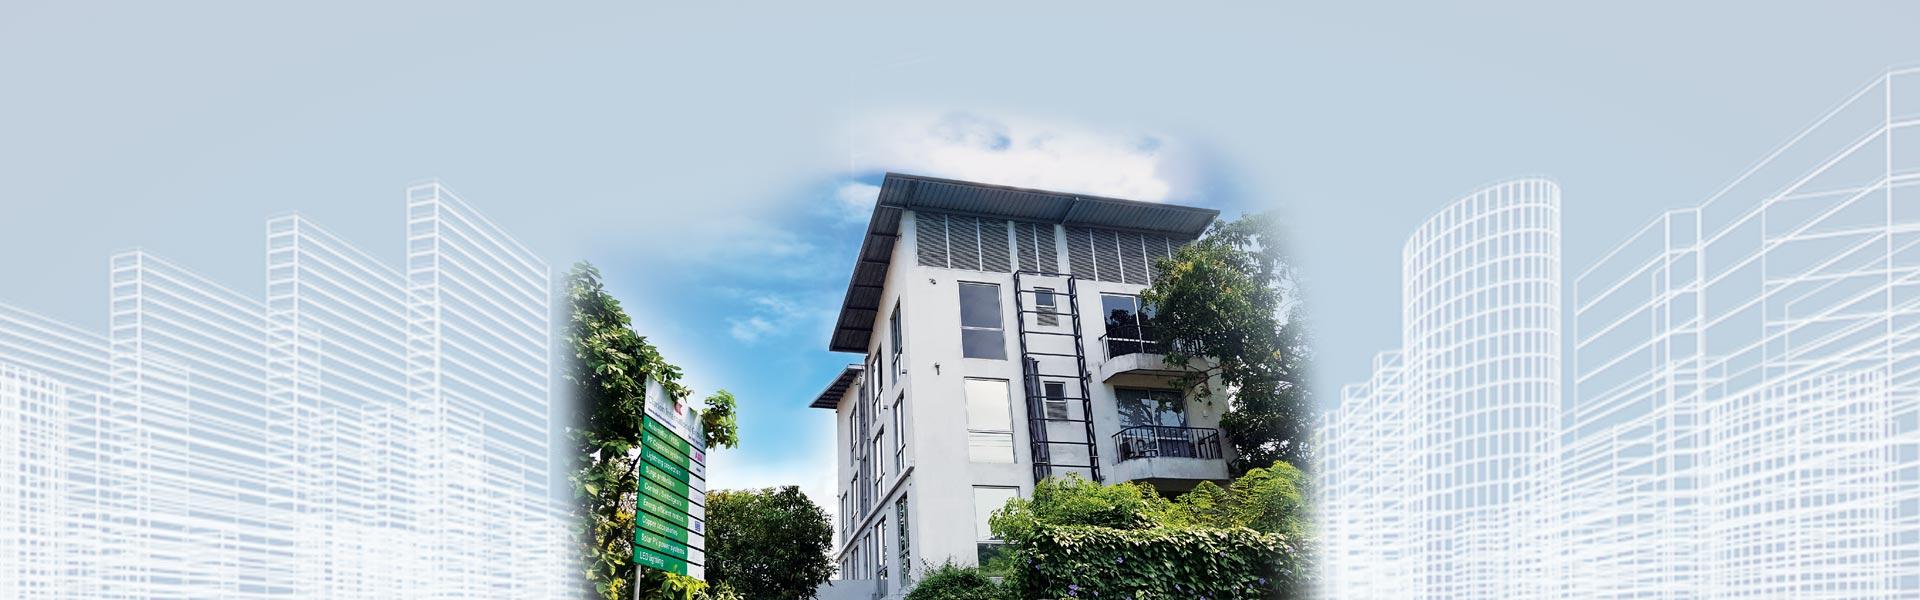 Clarion Energy Sri Lanka Office External View